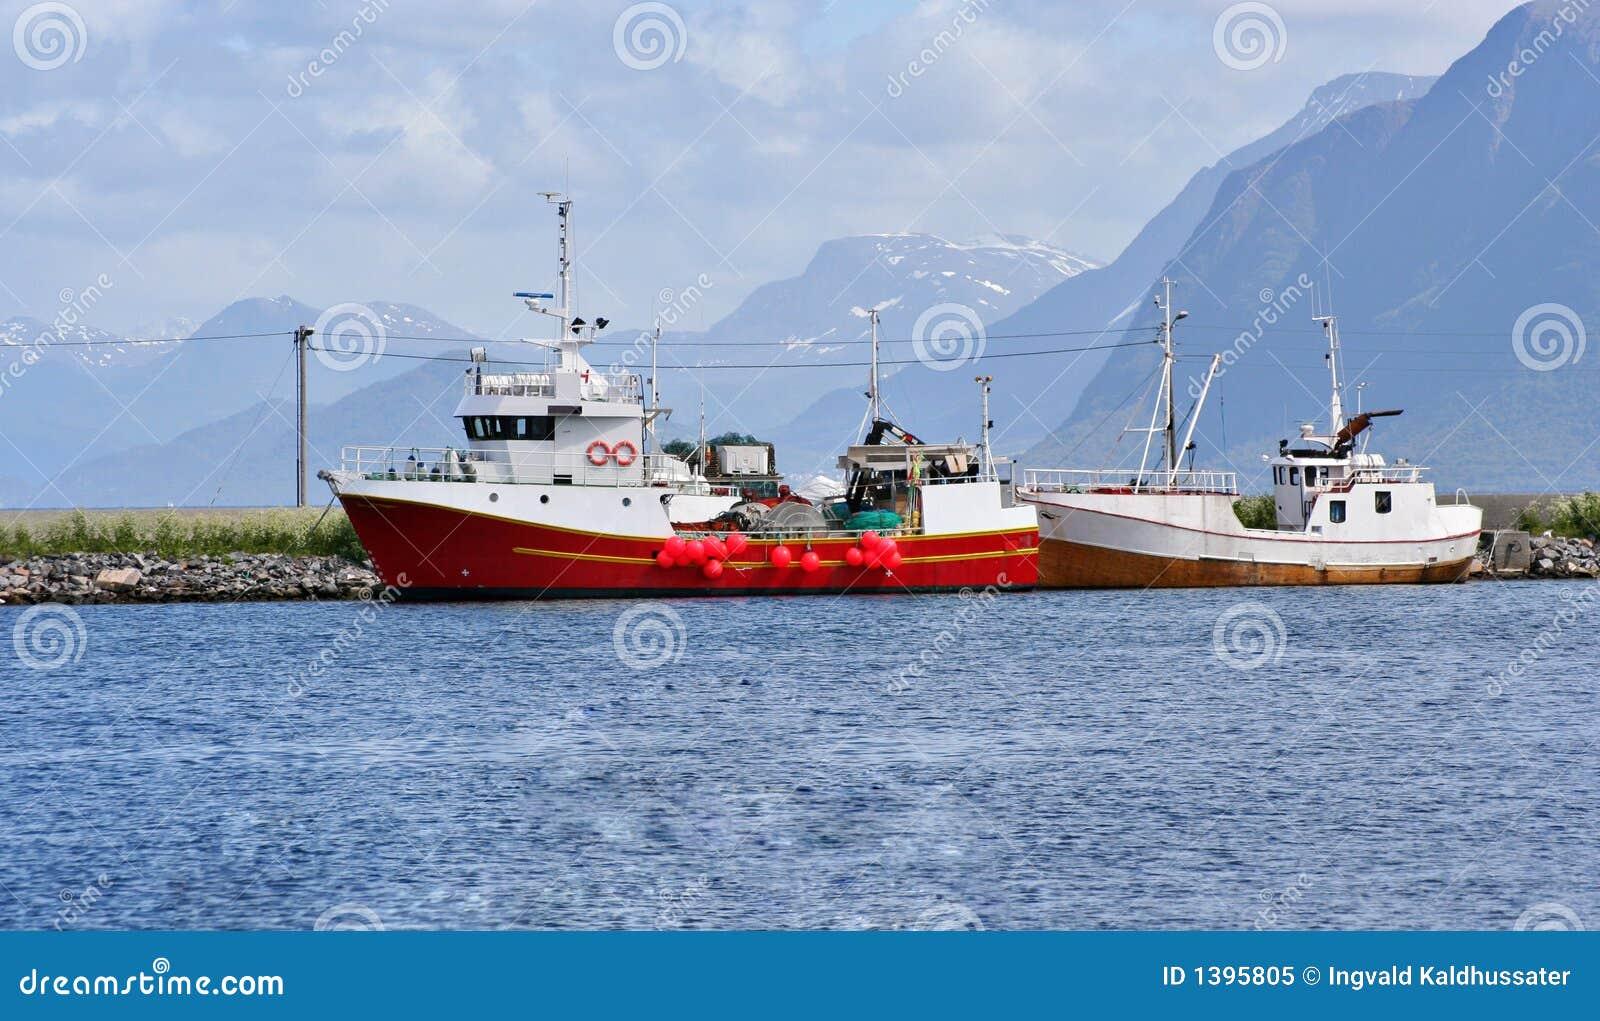 Fishing boats royalty free stock photo image 1395805 for Free fishing boats